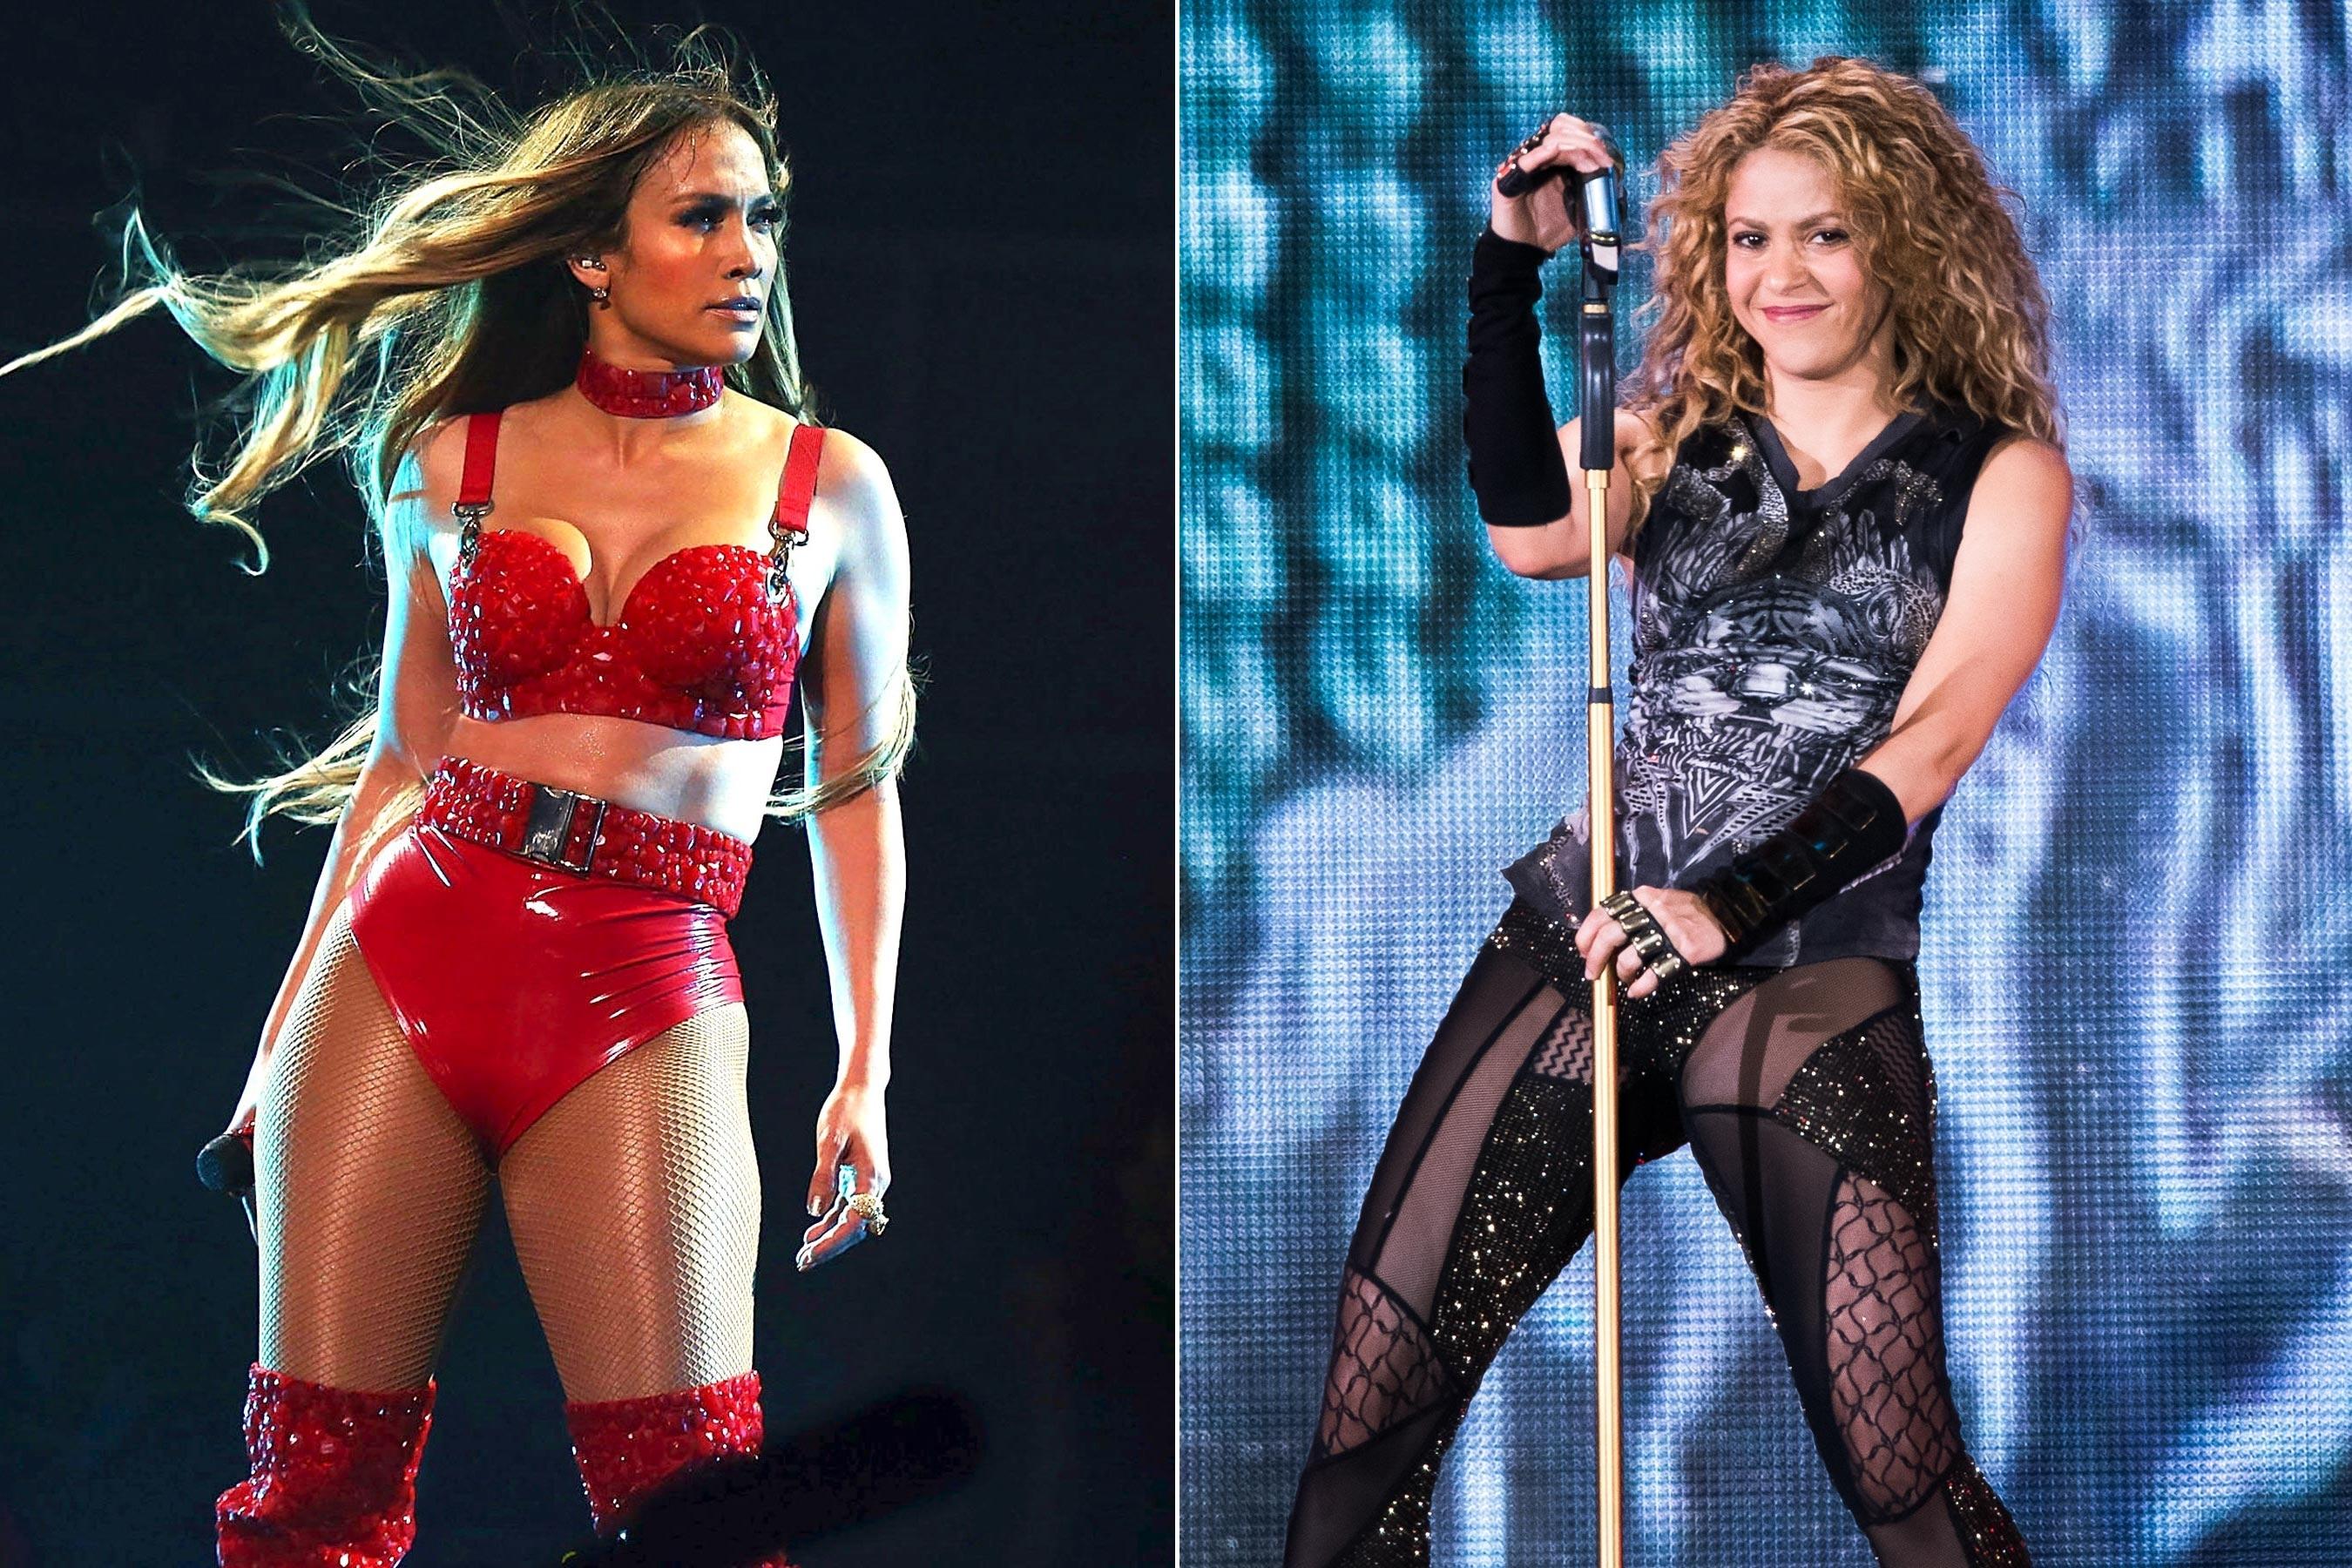 Jennifer Lopez, Shakira Will Be The 2020 Super Bowl Halftime regarding Super Bowl Halftime Show 2020